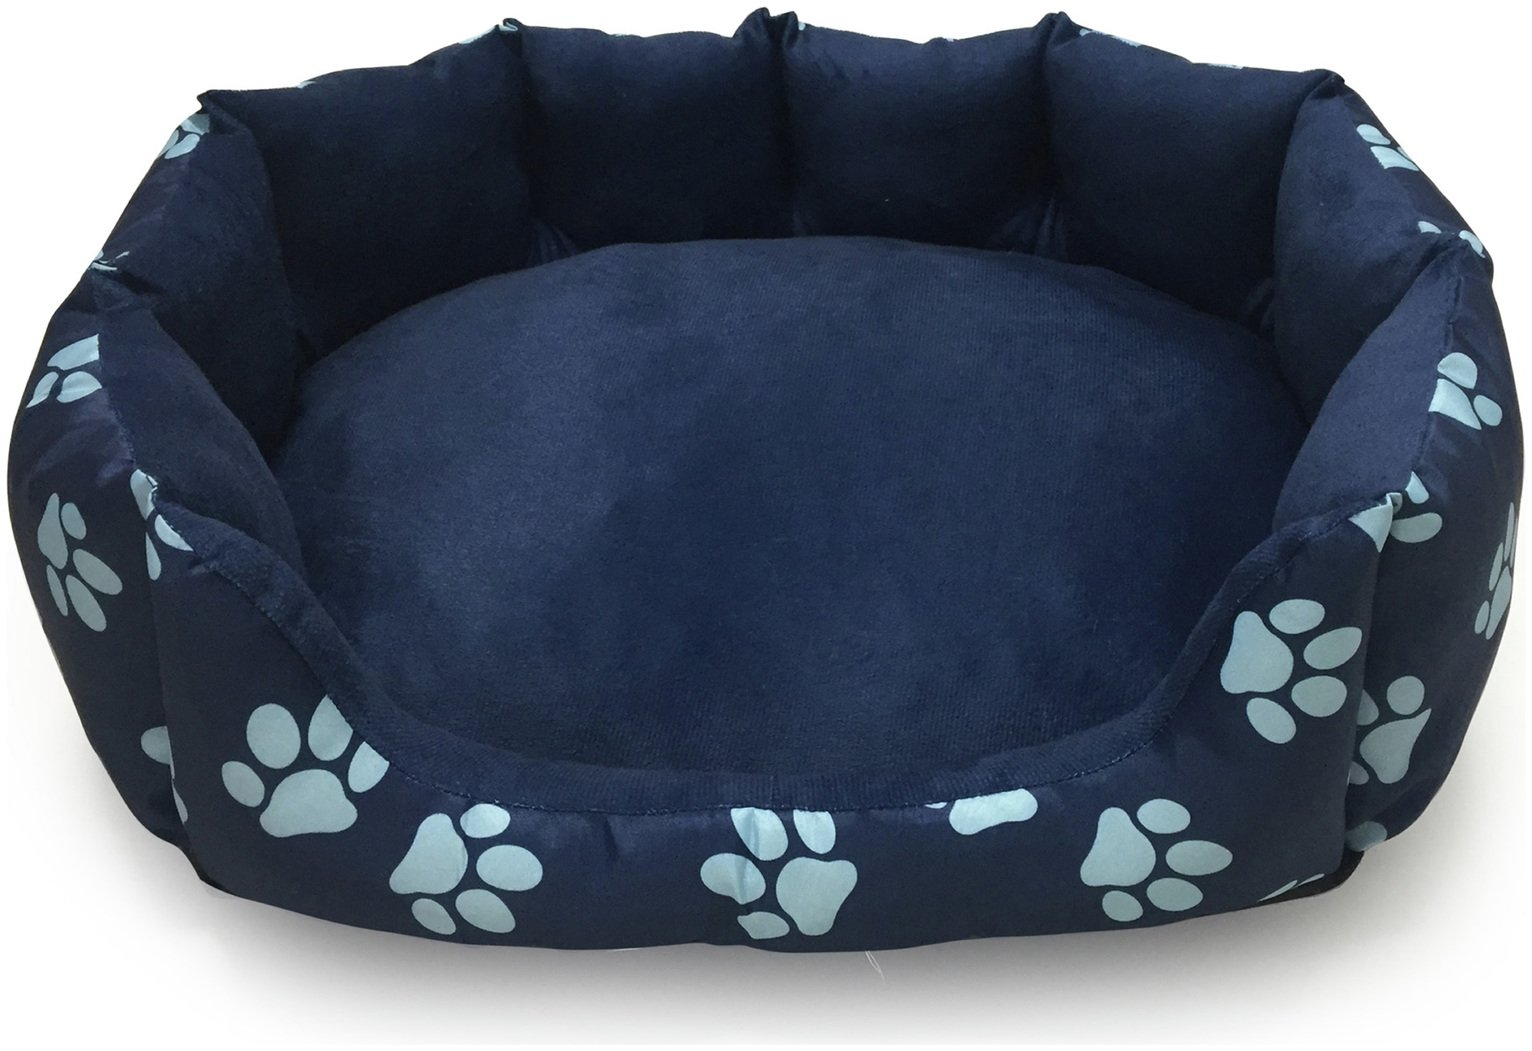 Paw Print Oval Navy Pet Bed - Medium